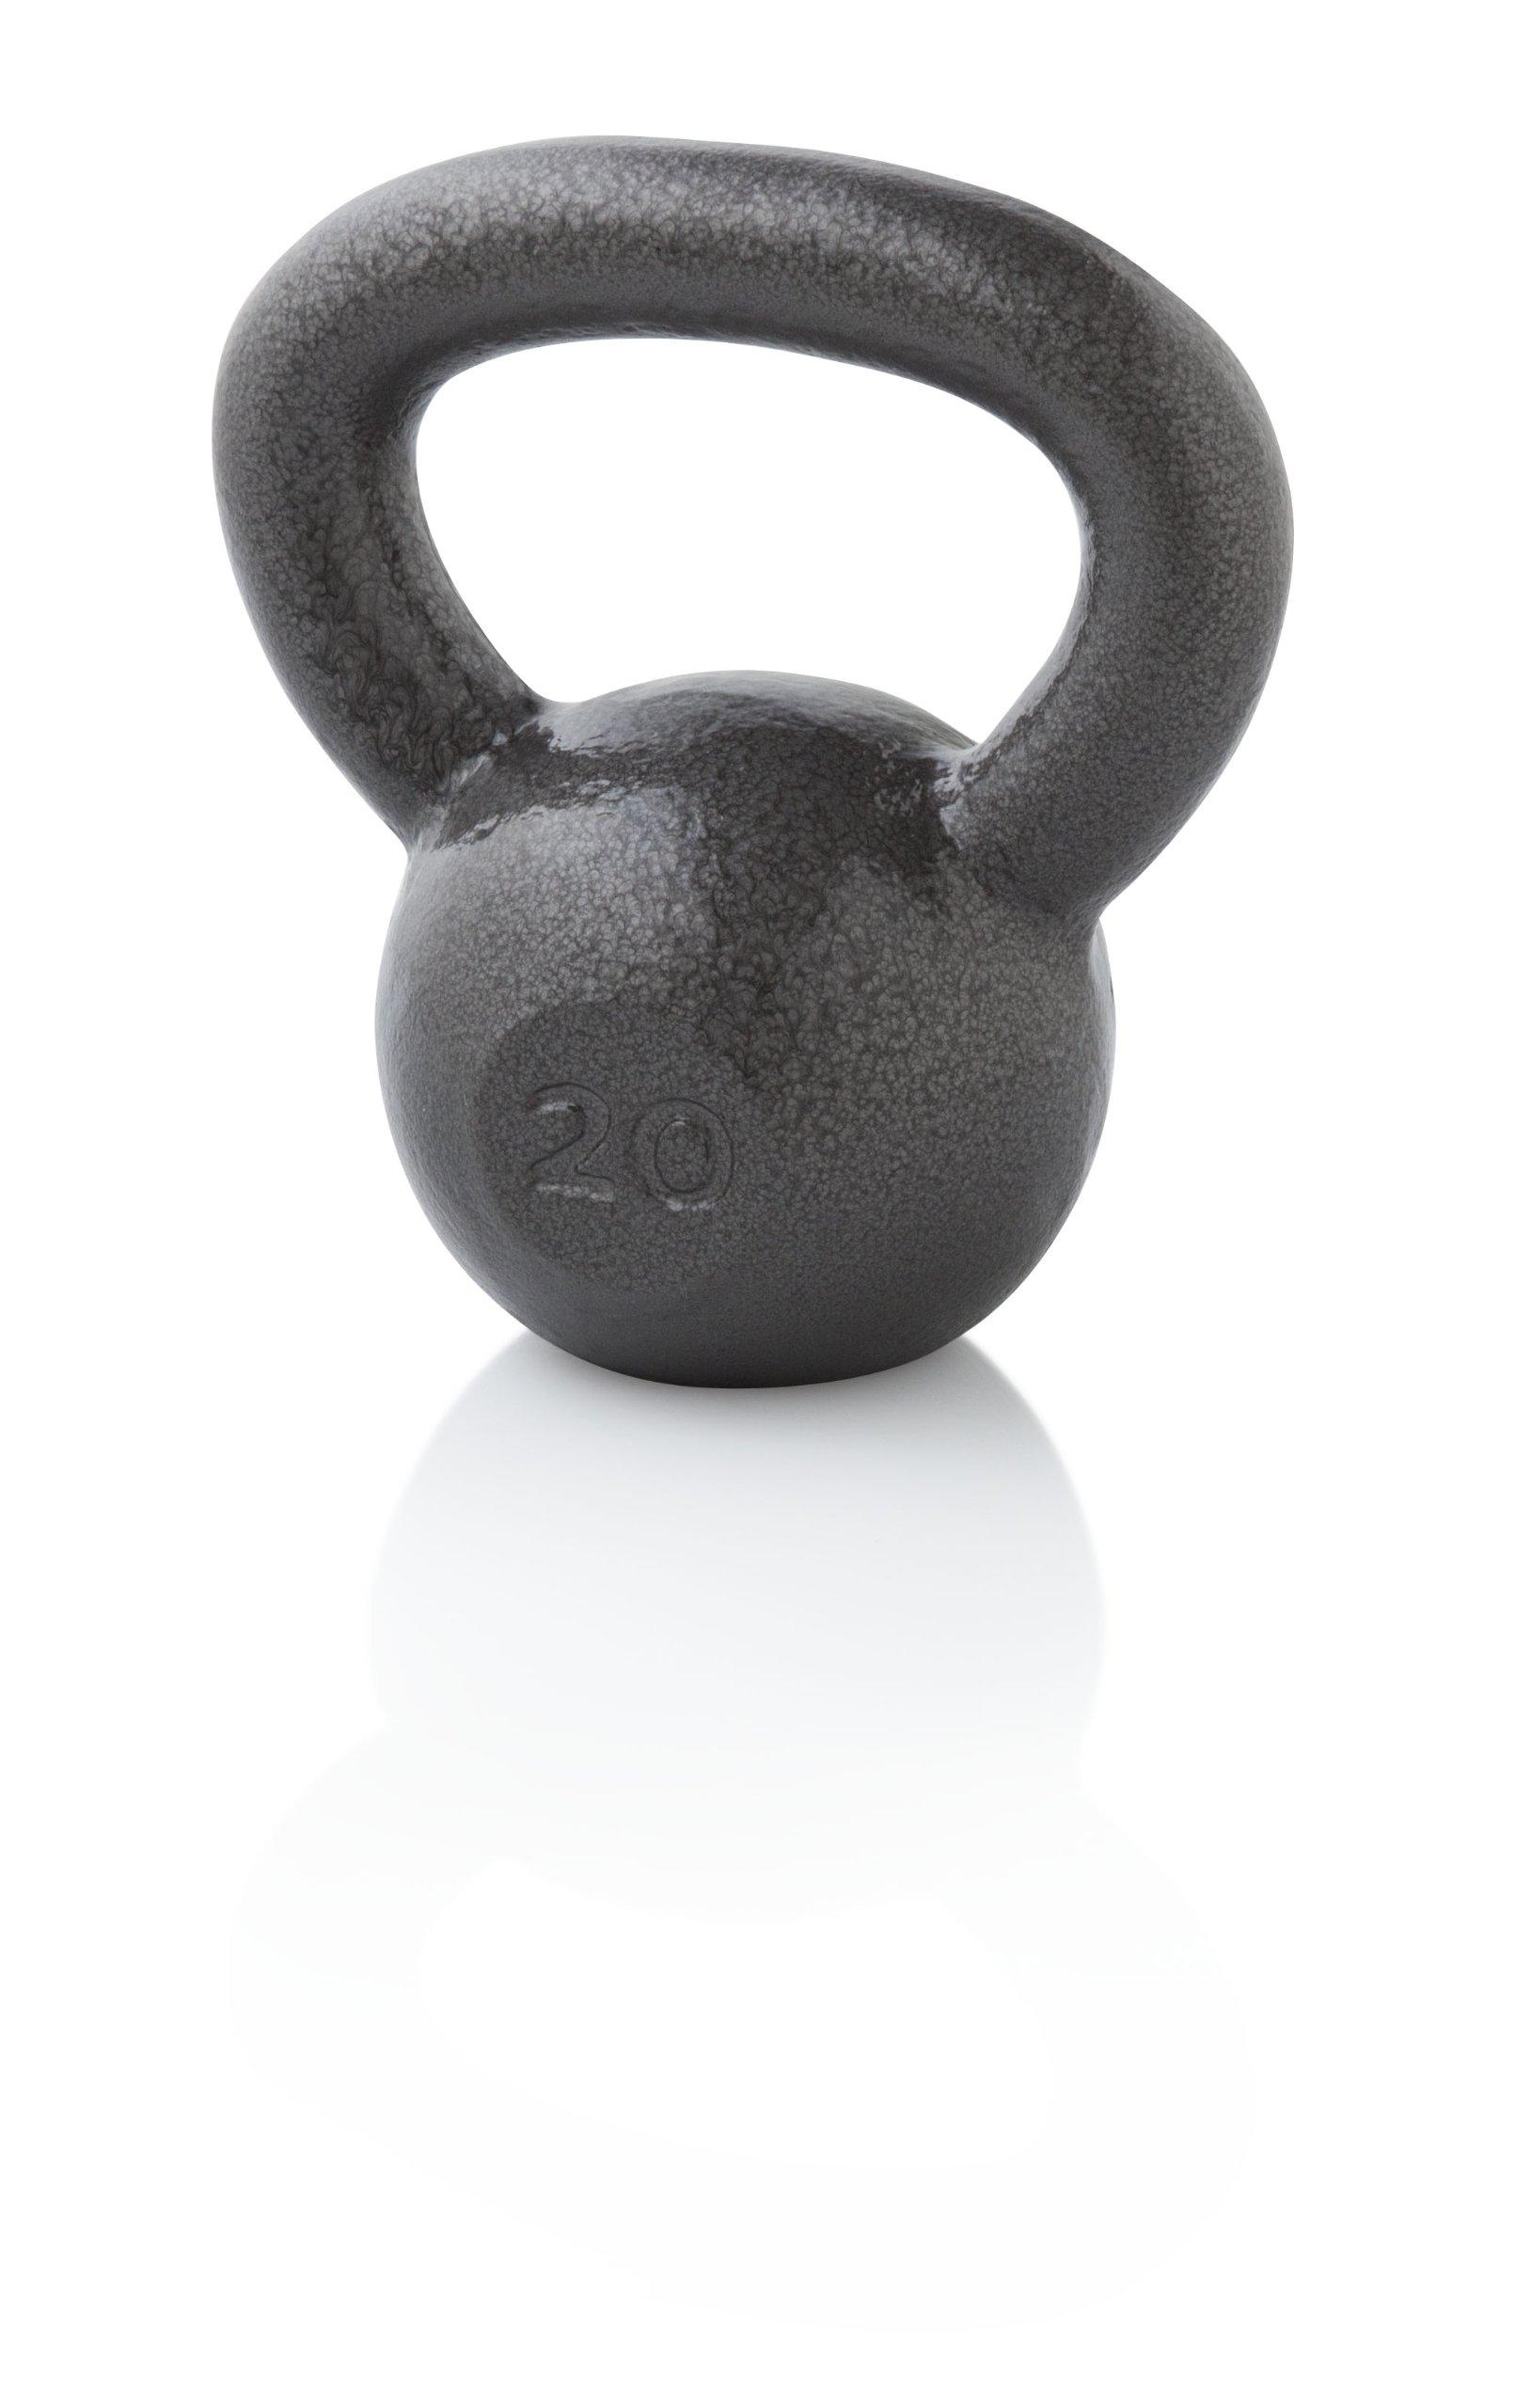 Weider Kettlebell-Gewicht, 9 kg